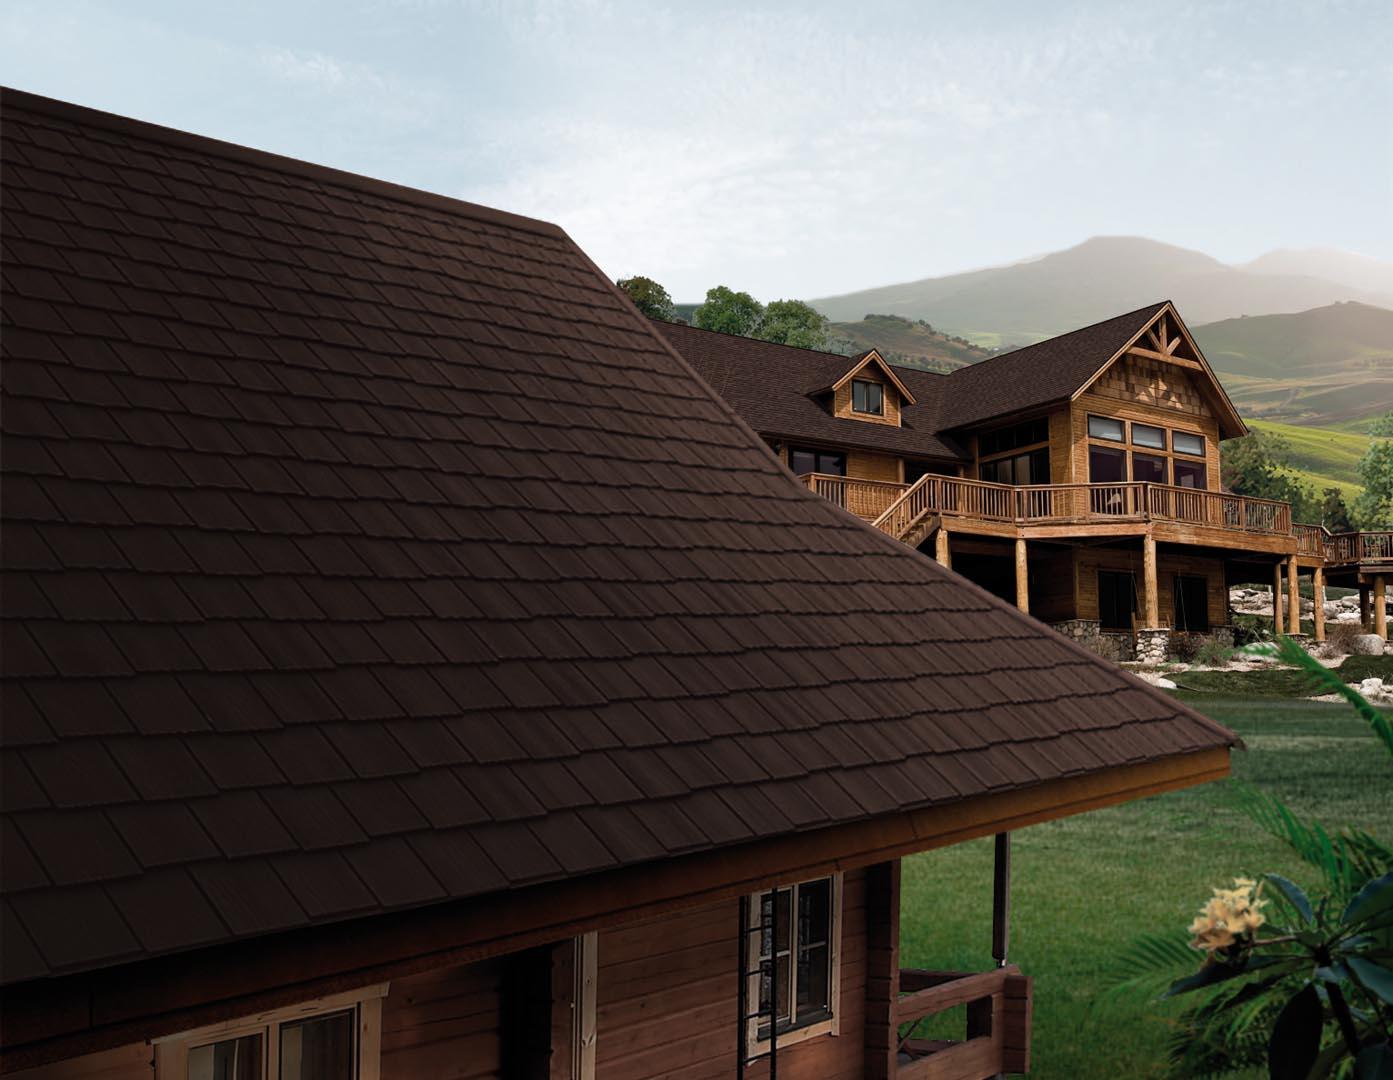 SCG-Fiber-Cement-Roof-Ayara-Timber-Lumber-Hazel-Brown